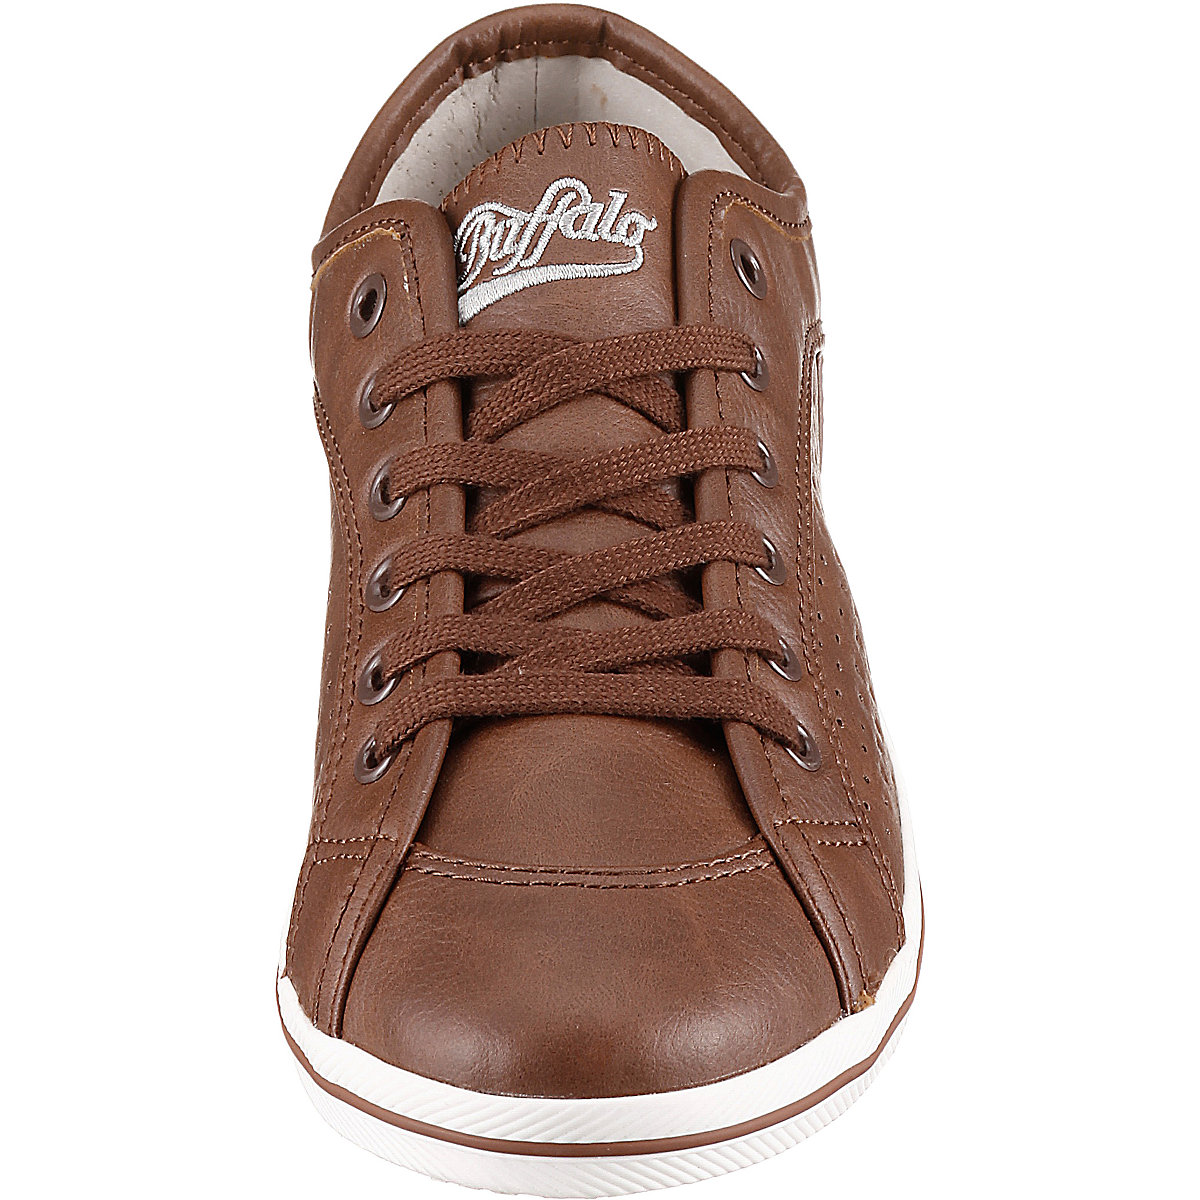 BUFFALO, BUFFALO Sneakers, braun   mirapodo